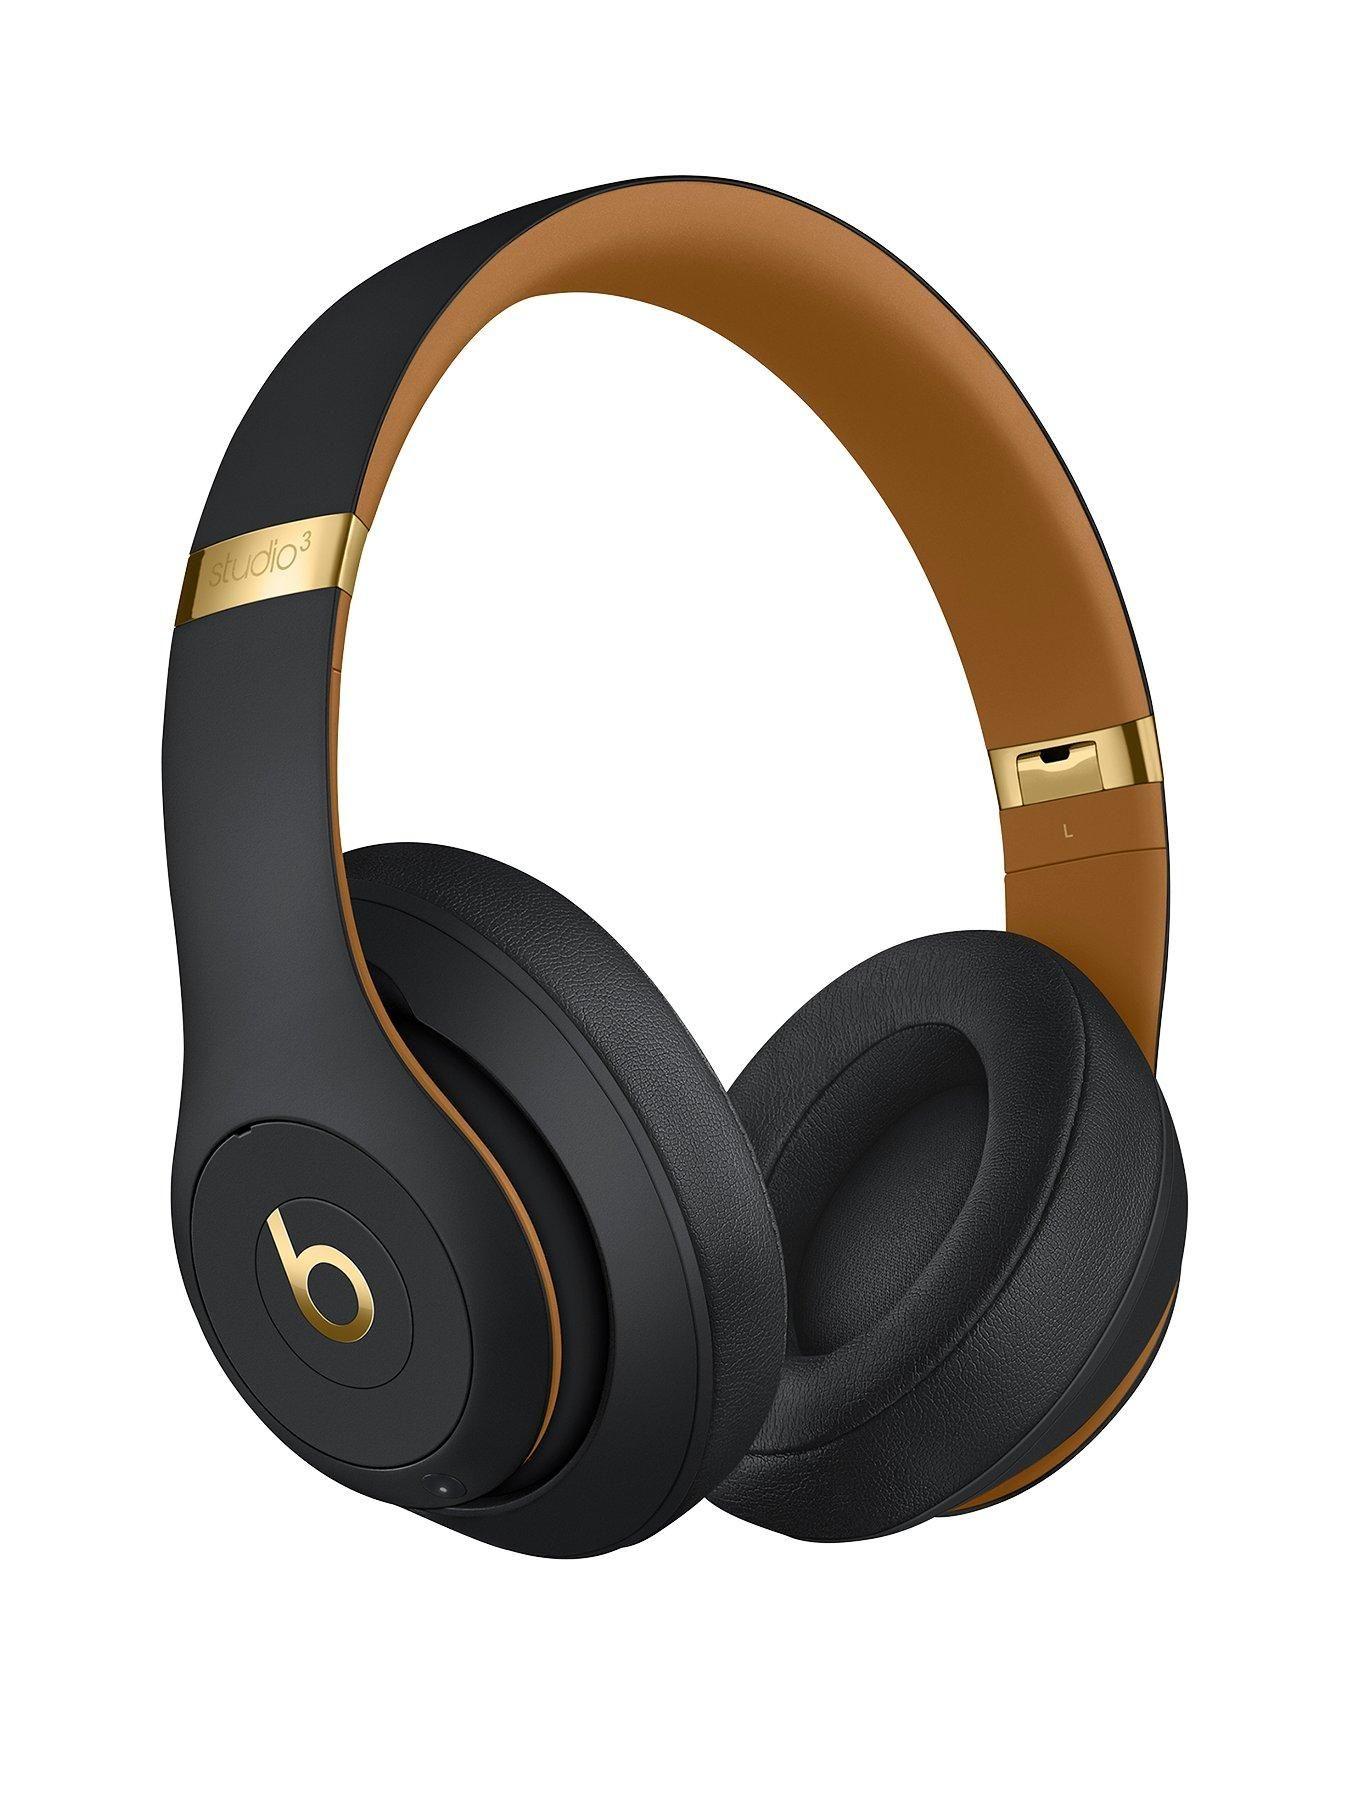 247a2e43a5a3f Beats by Dr Dre Studio 3 Wireless Headphones – Beats Skyline Collection